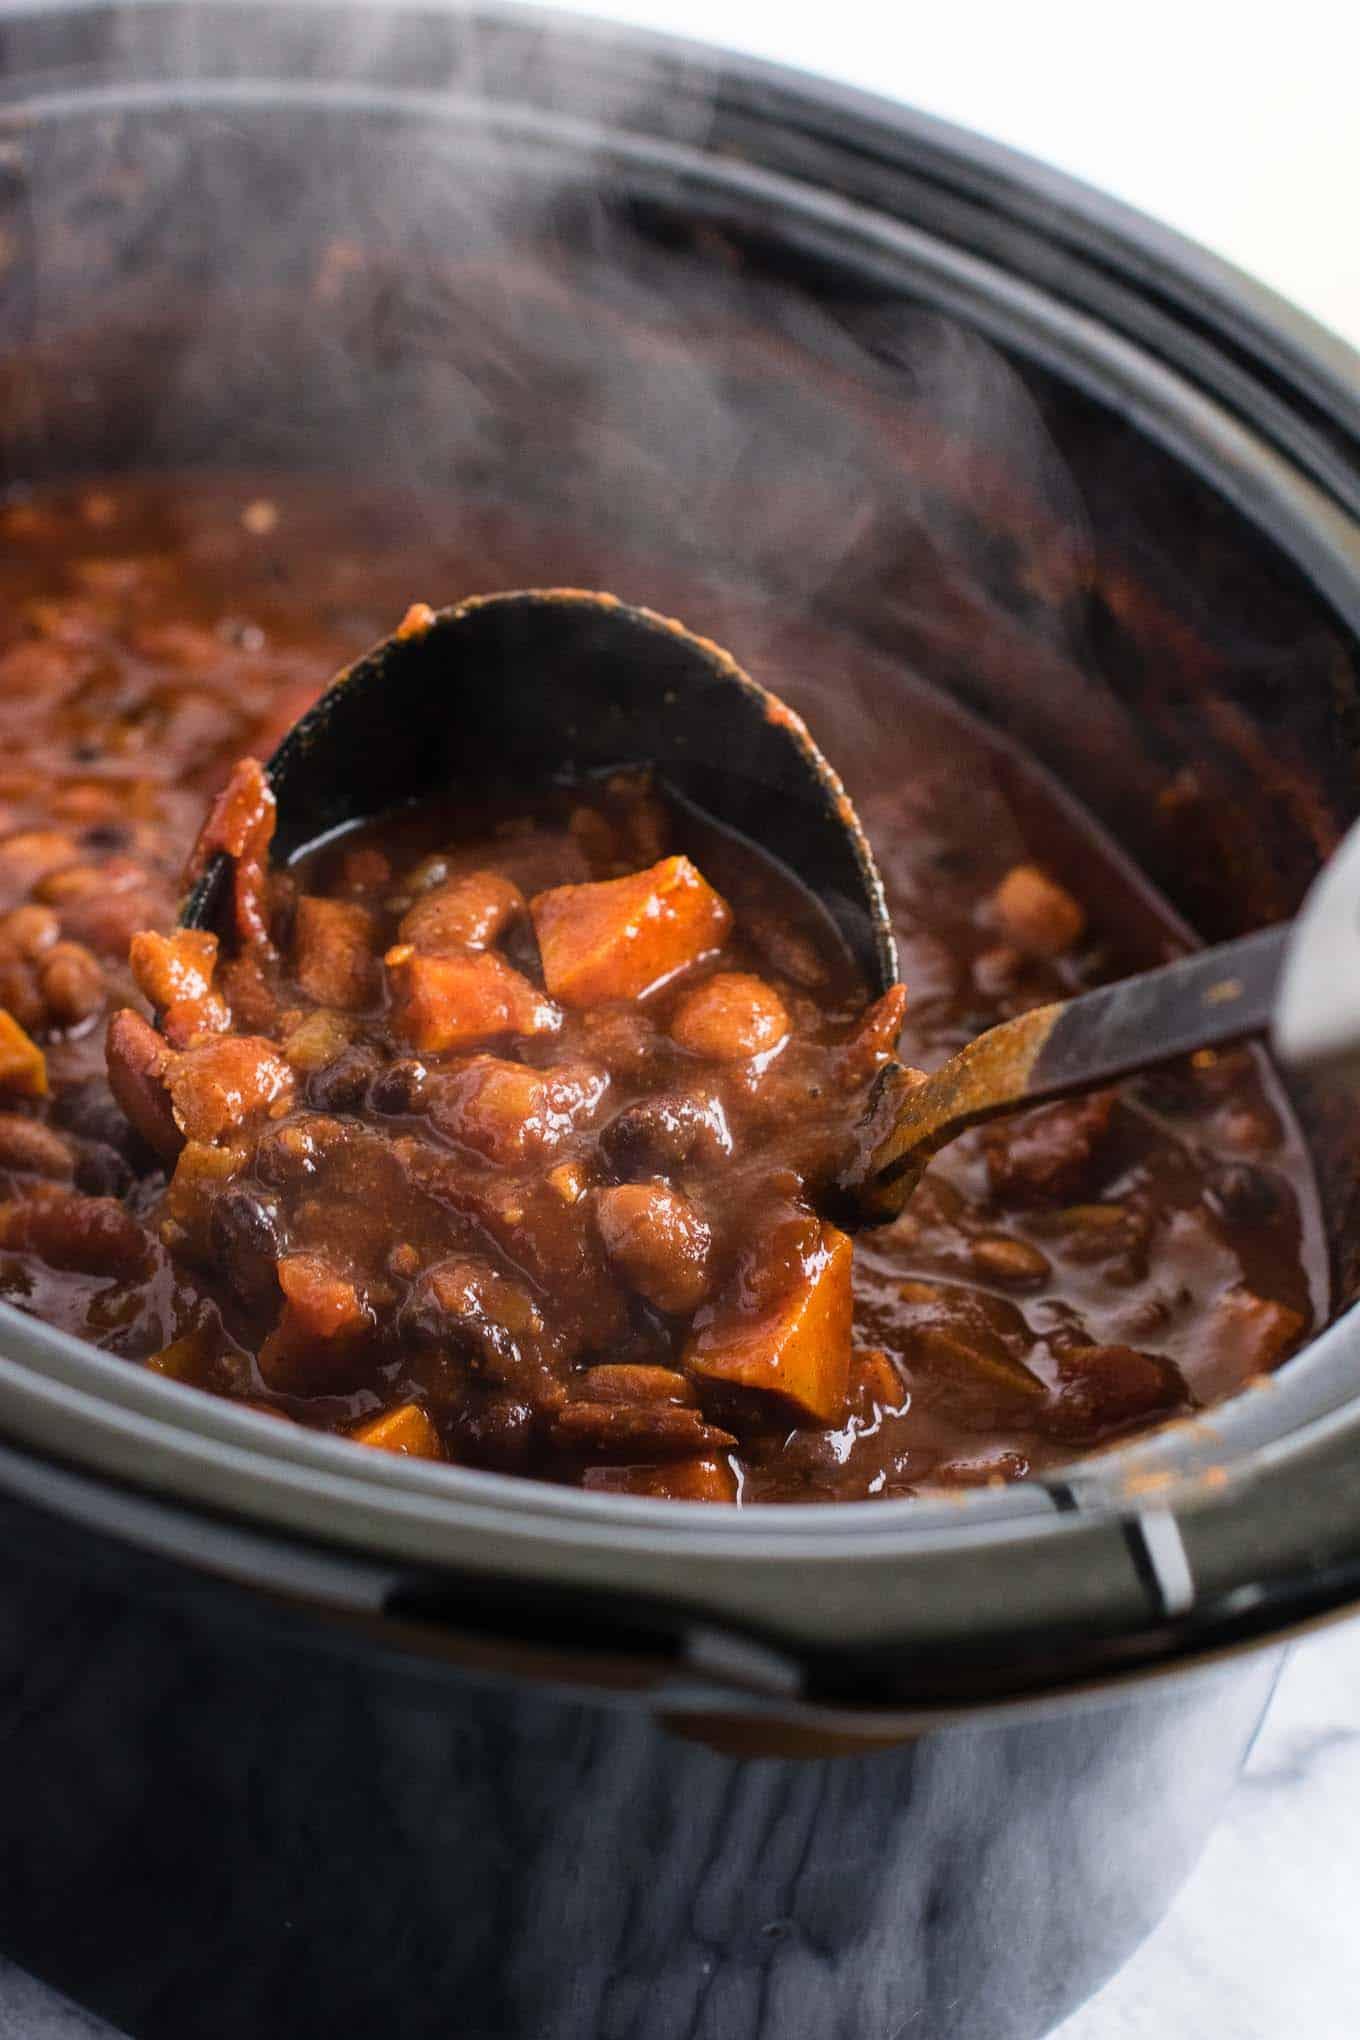 This slow cooker vegetarian sweet potato chili takes just 10 minutes to prep! #vegetarian #chili #sweetpotatochili #meatless #dinner #slowcooker #crockpot